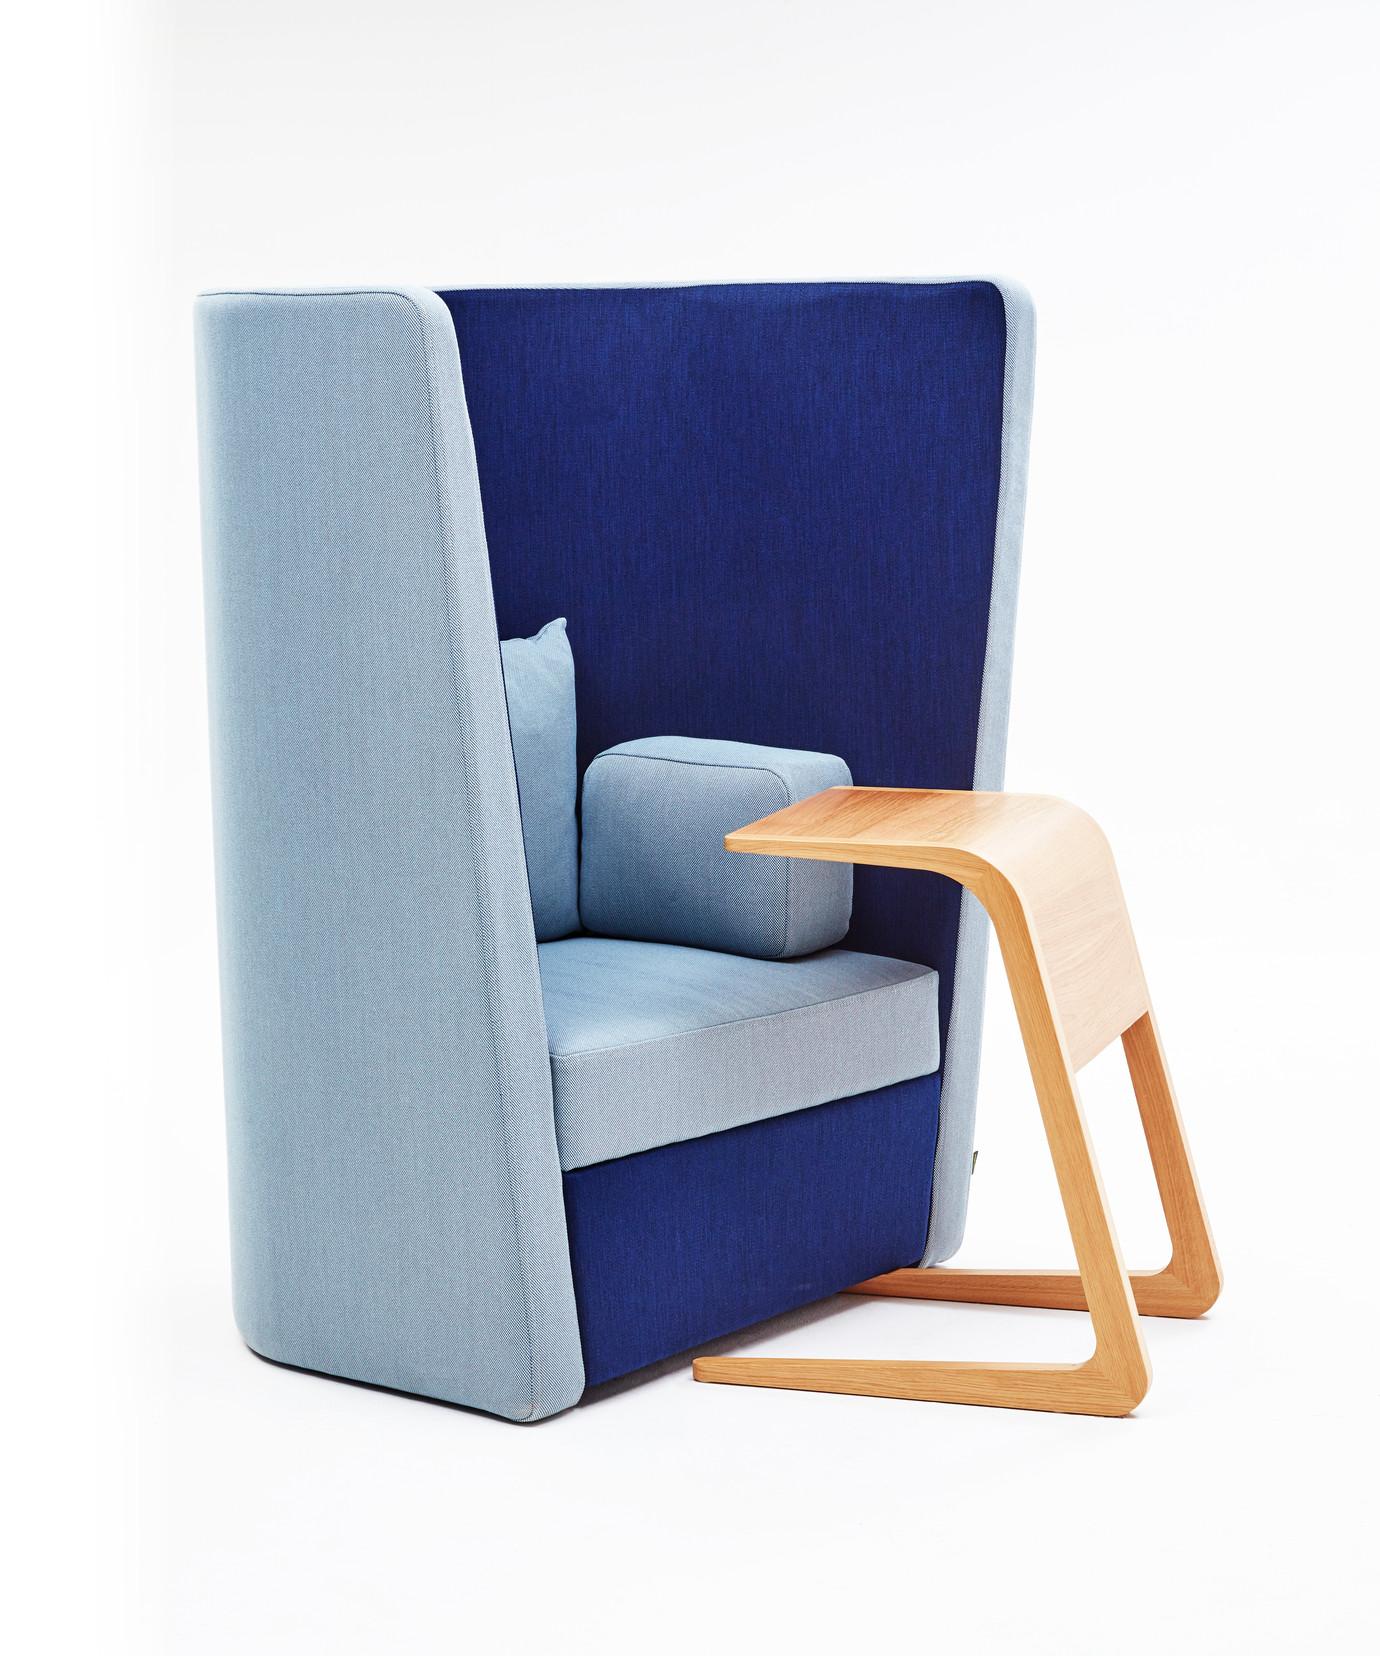 1-Silla-Lounge-Busby-Hero-1380